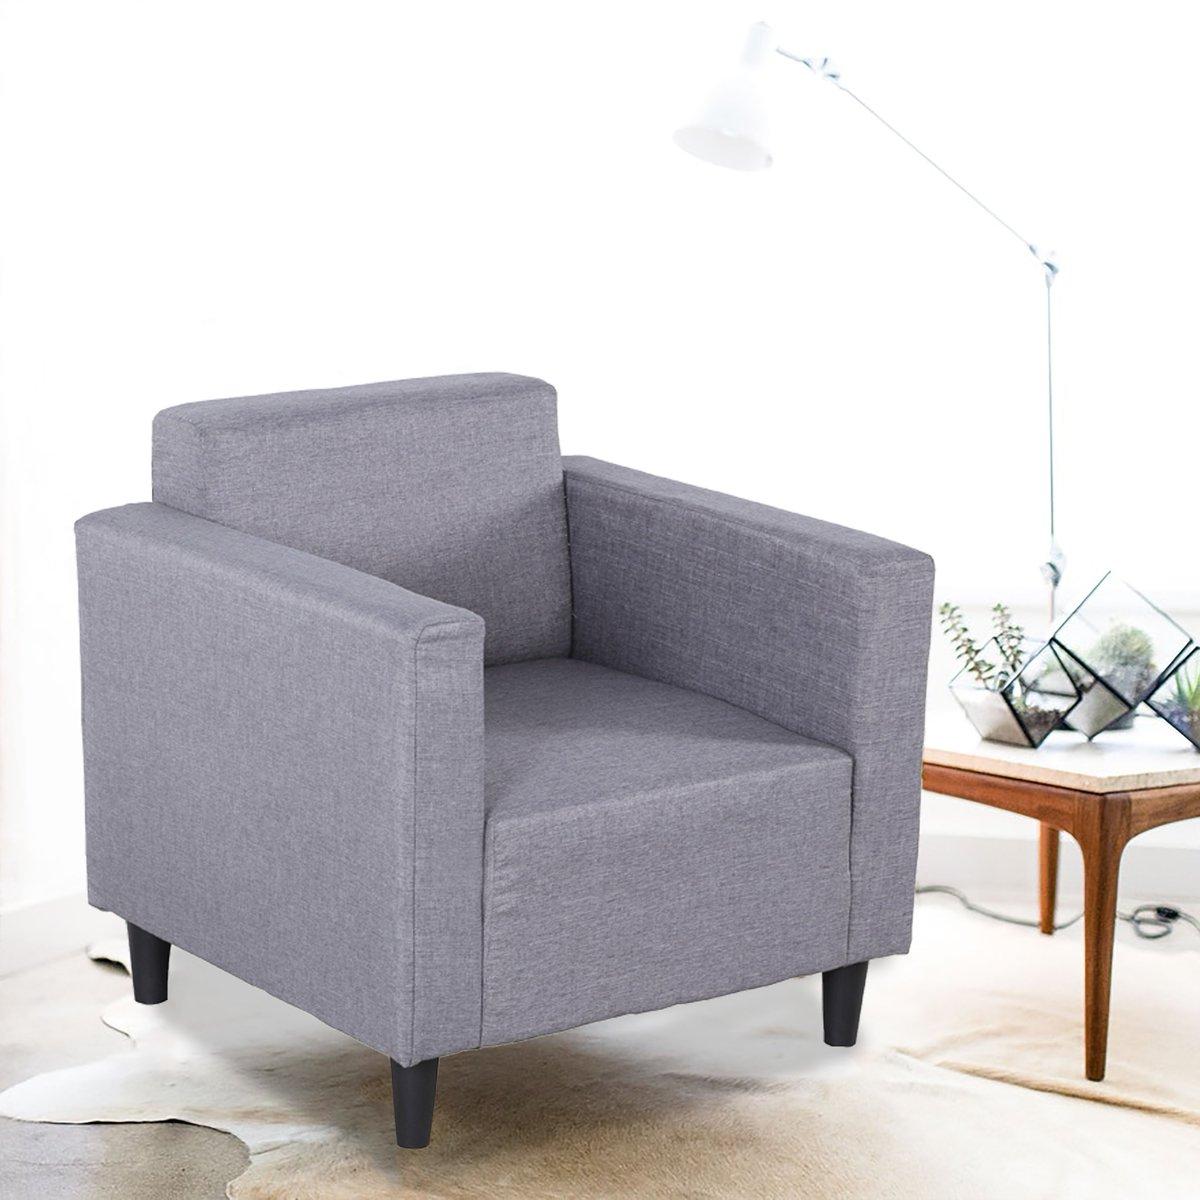 Koga Furniture On Twitter Sink Into